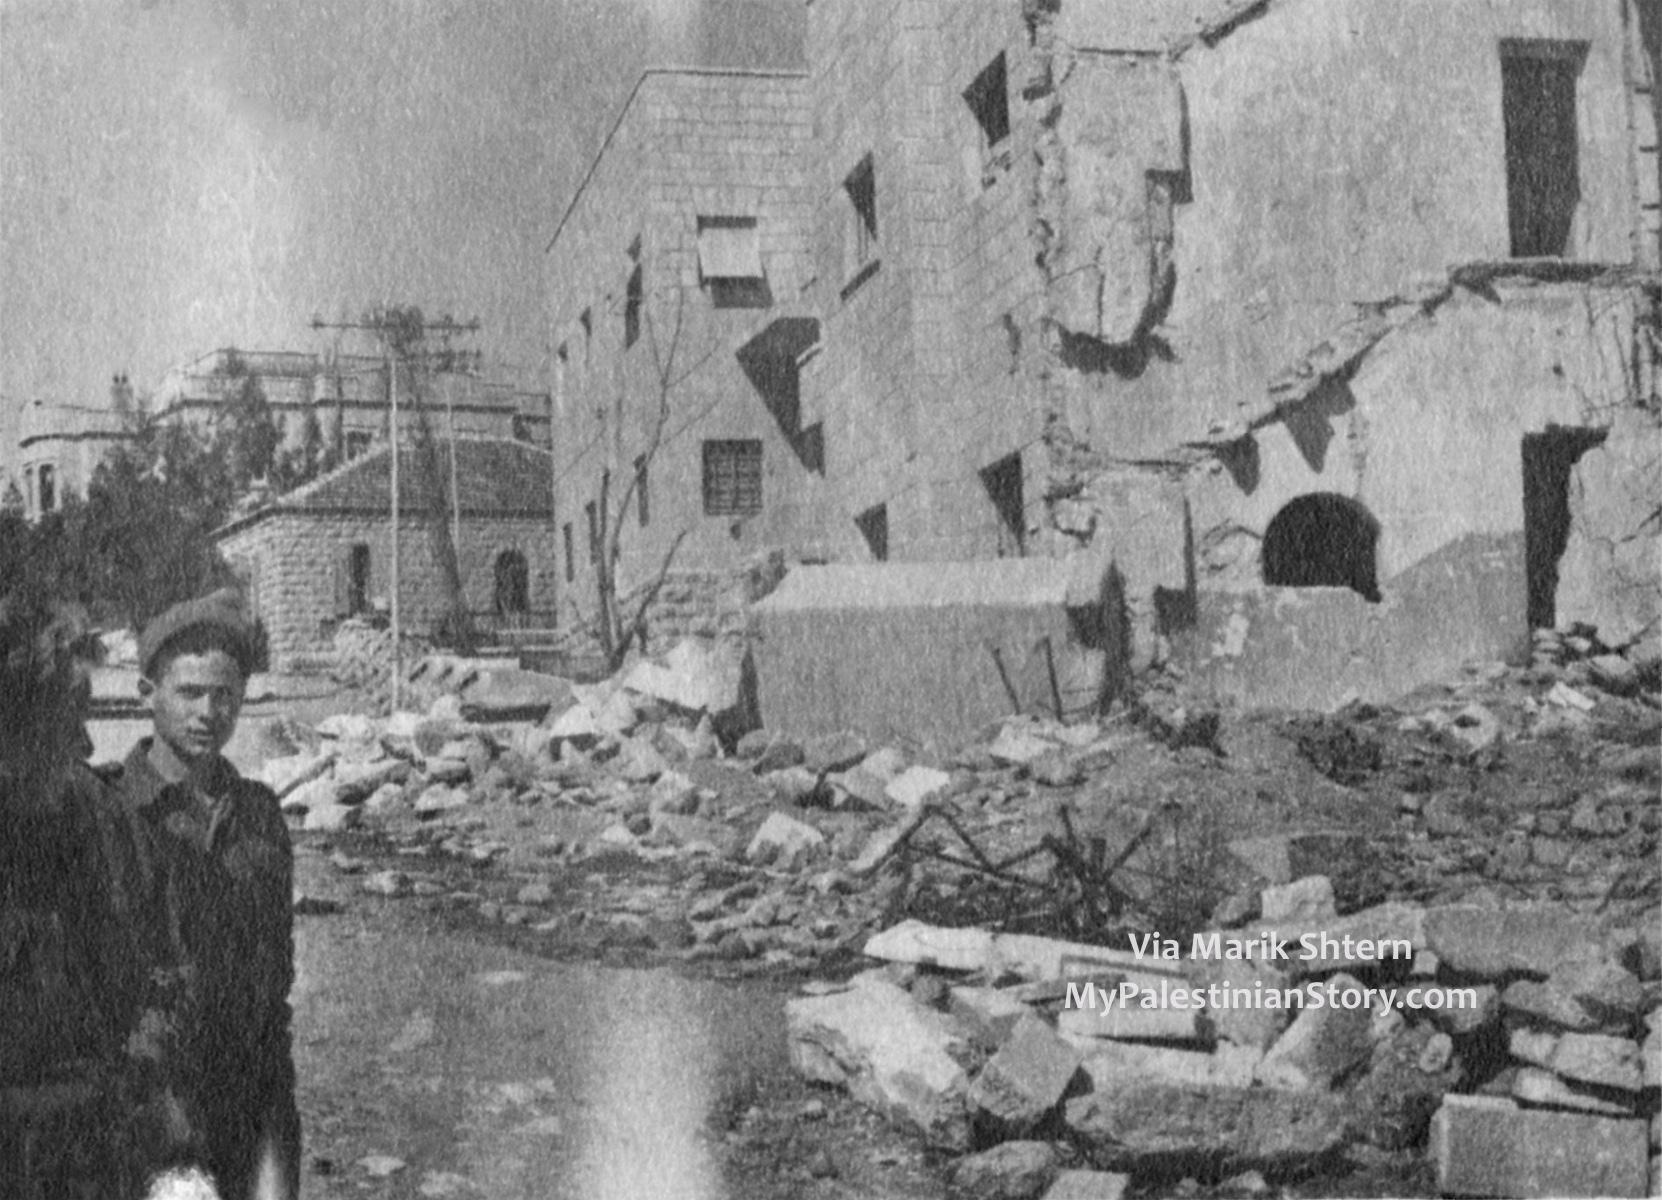 The bombed Semiramis with the Kassotis house in the background. (Photo via Marik Shtern)